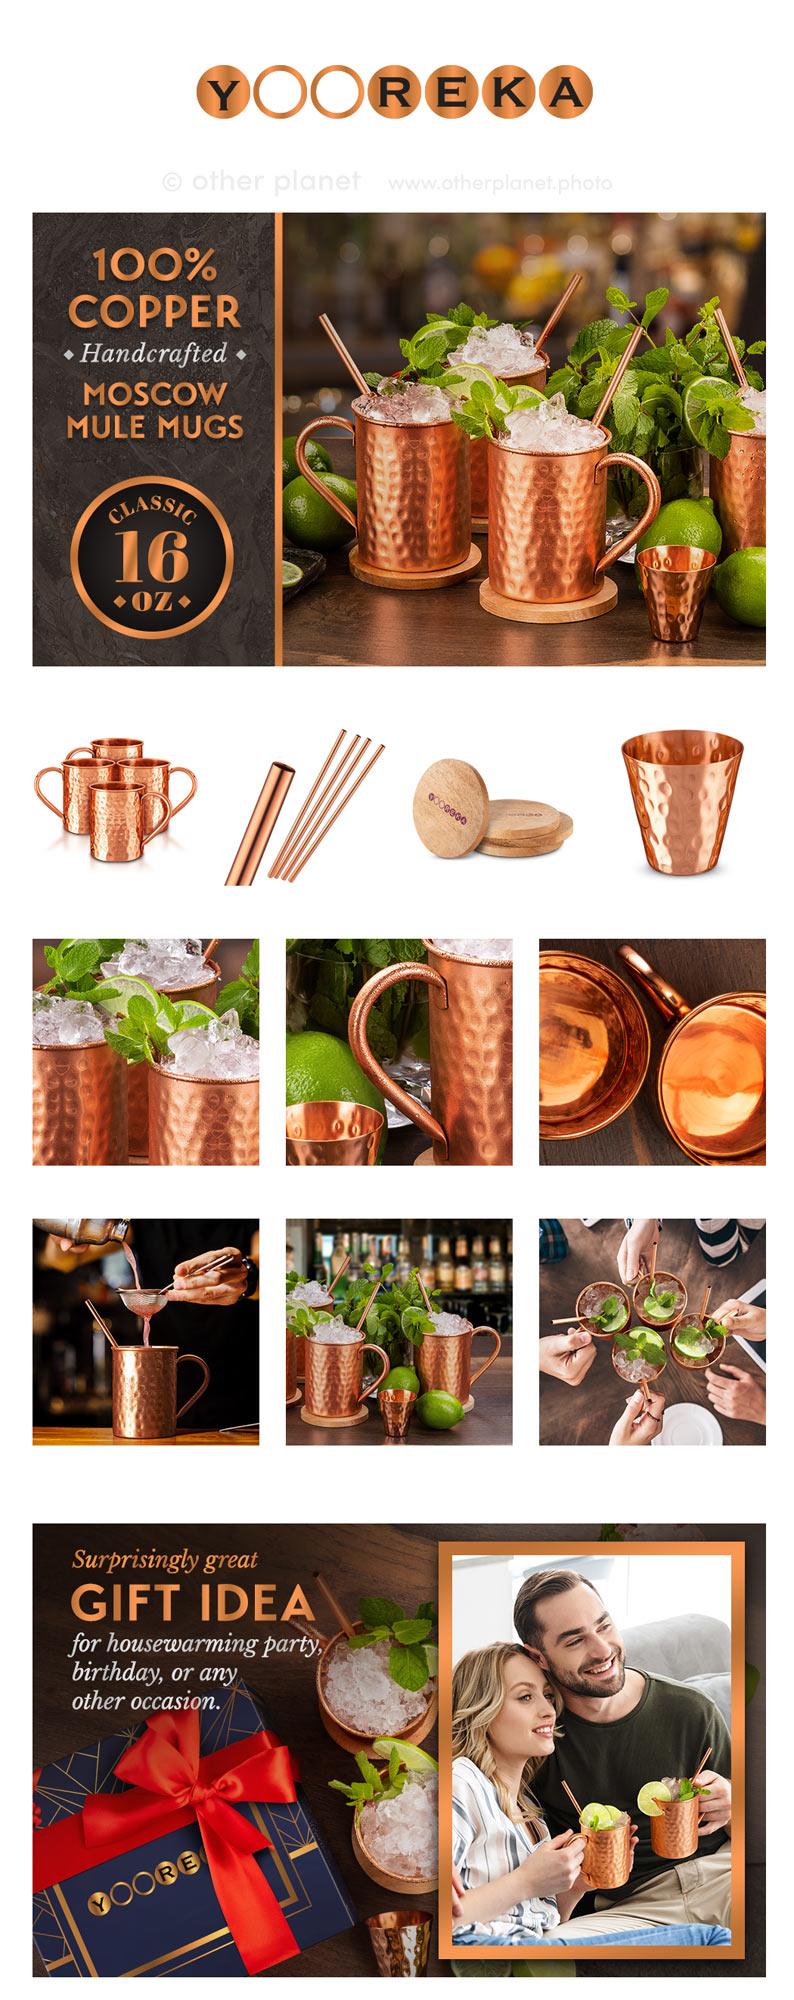 photoshoot for amazon product EBC Moscow Mule Mugs